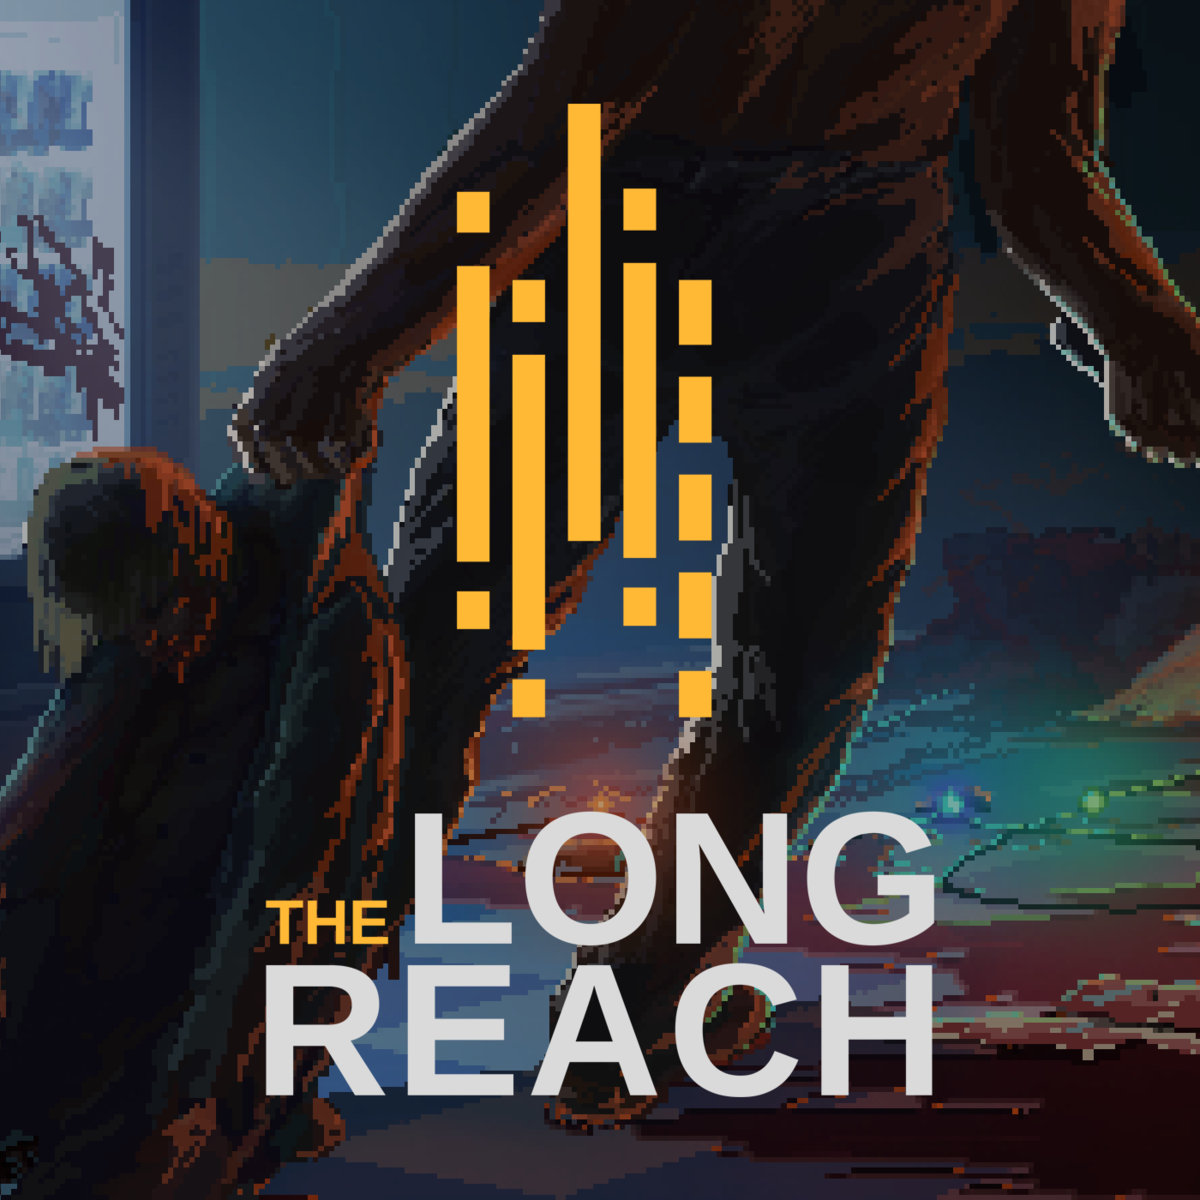 The Long Reach - Developer: Painted Black GamesPublisher: Merge GamesRelease Date: March 14, 2018